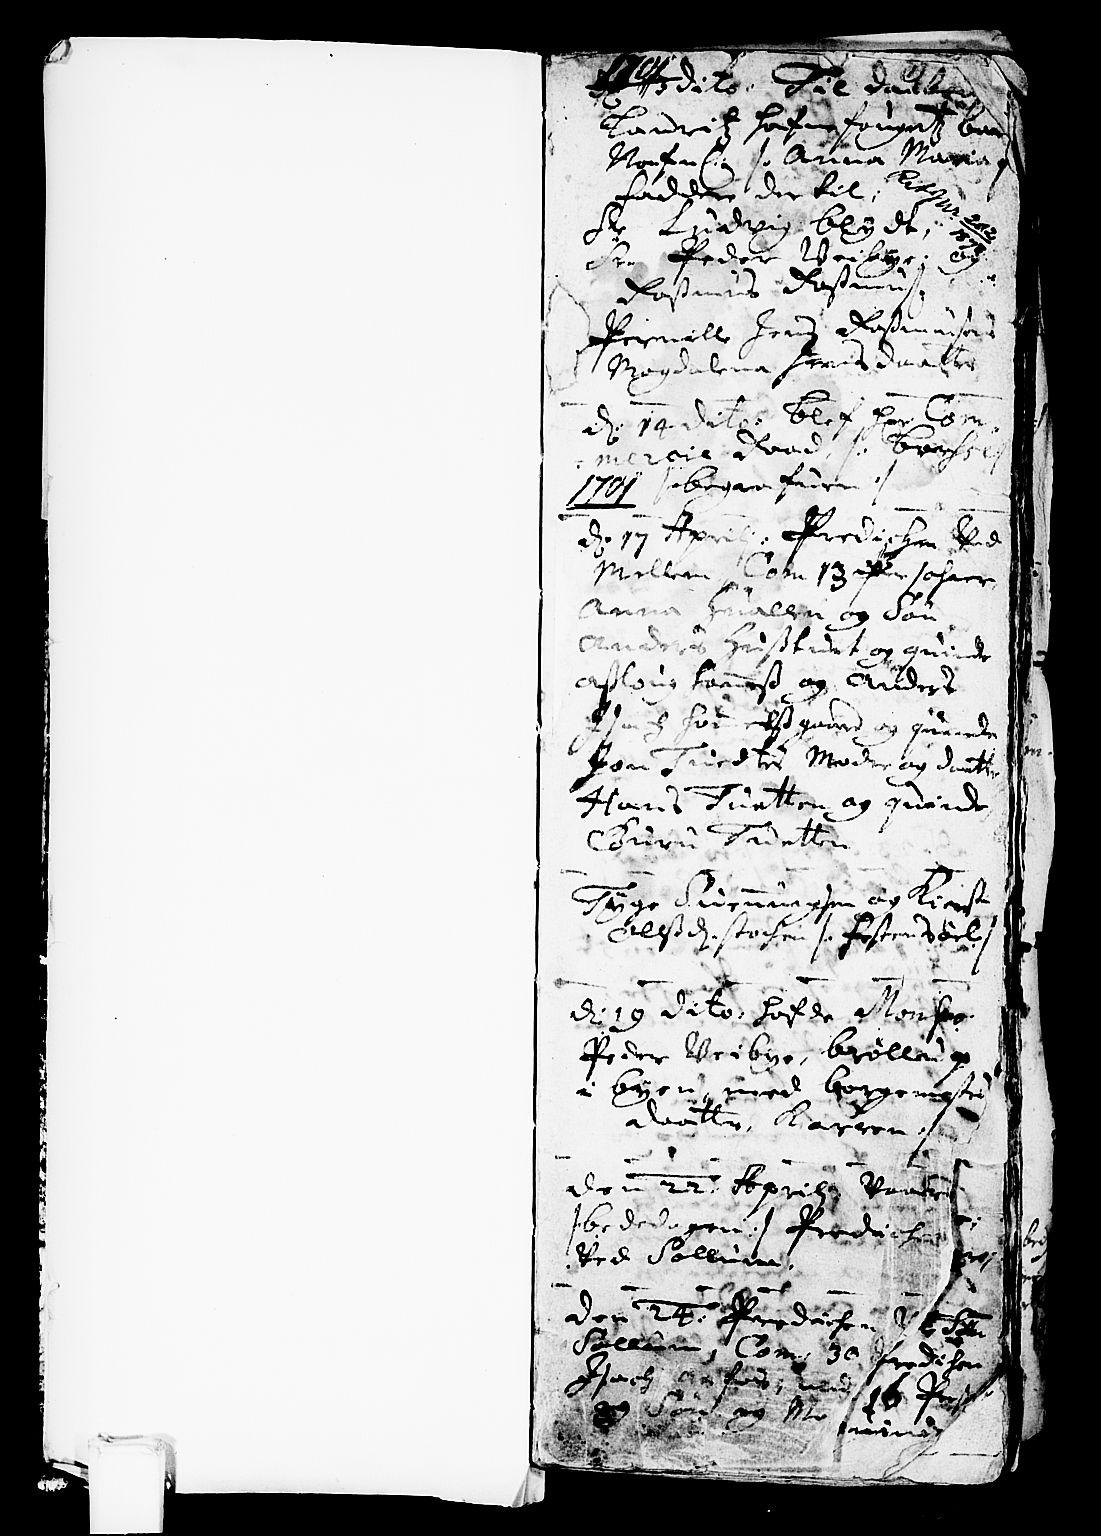 SAKO, Solum kirkebøker, F/Fa/L0001: Ministerialbok nr. I 1, 1701-1716, s. 1